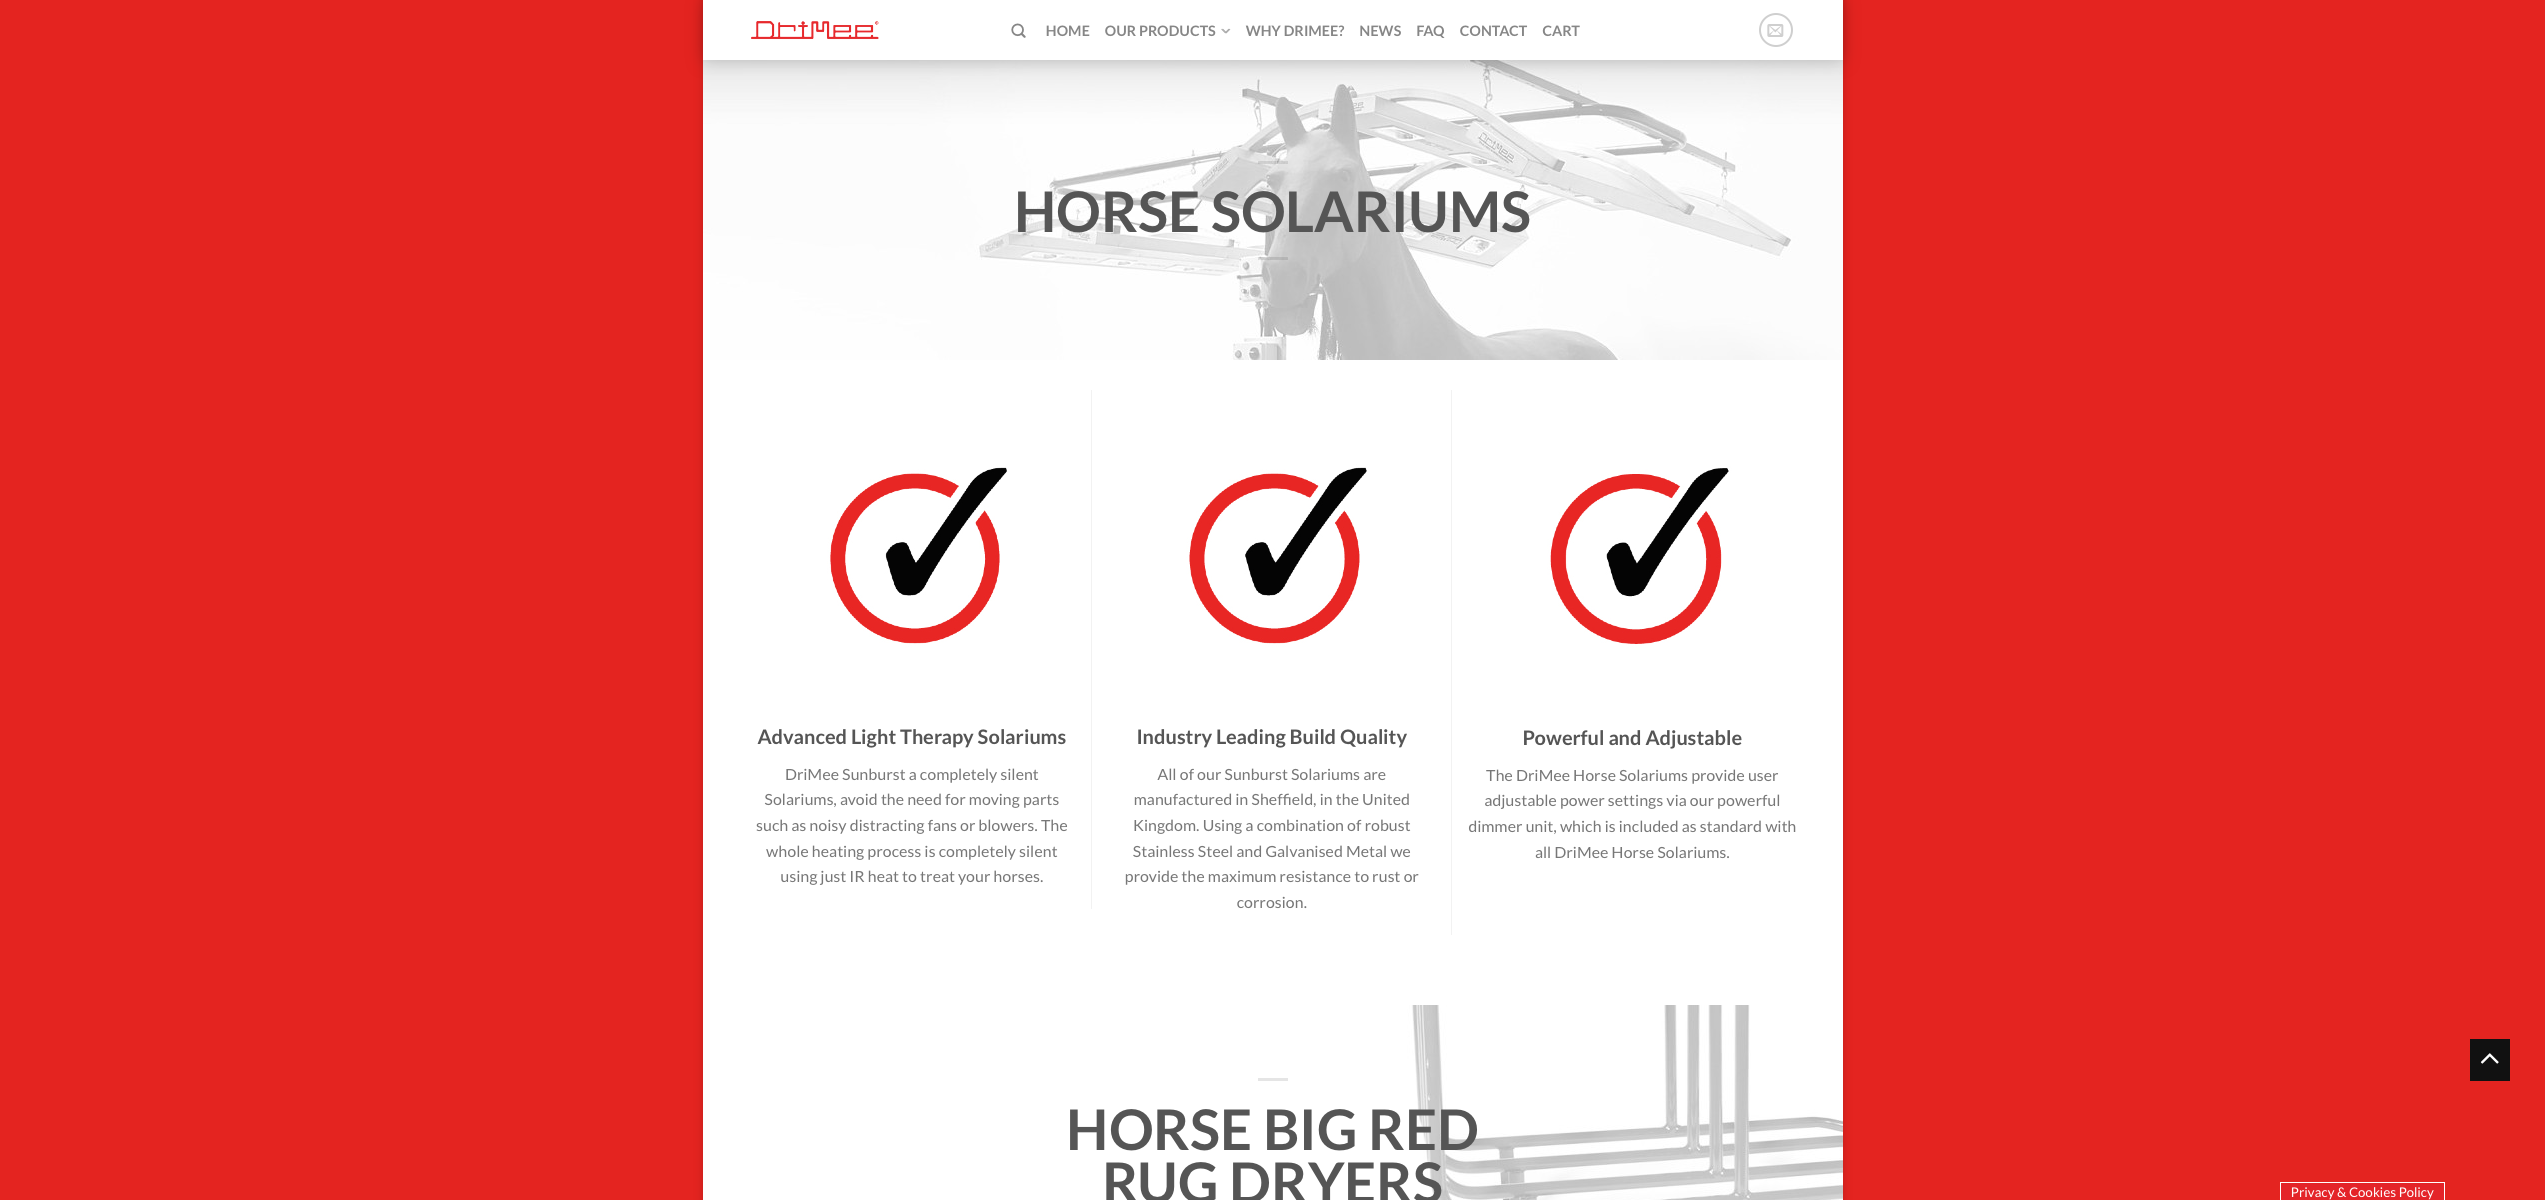 IDEA UK Design and Marketing Drimee Equestrian Horse Equipment Website Design 15